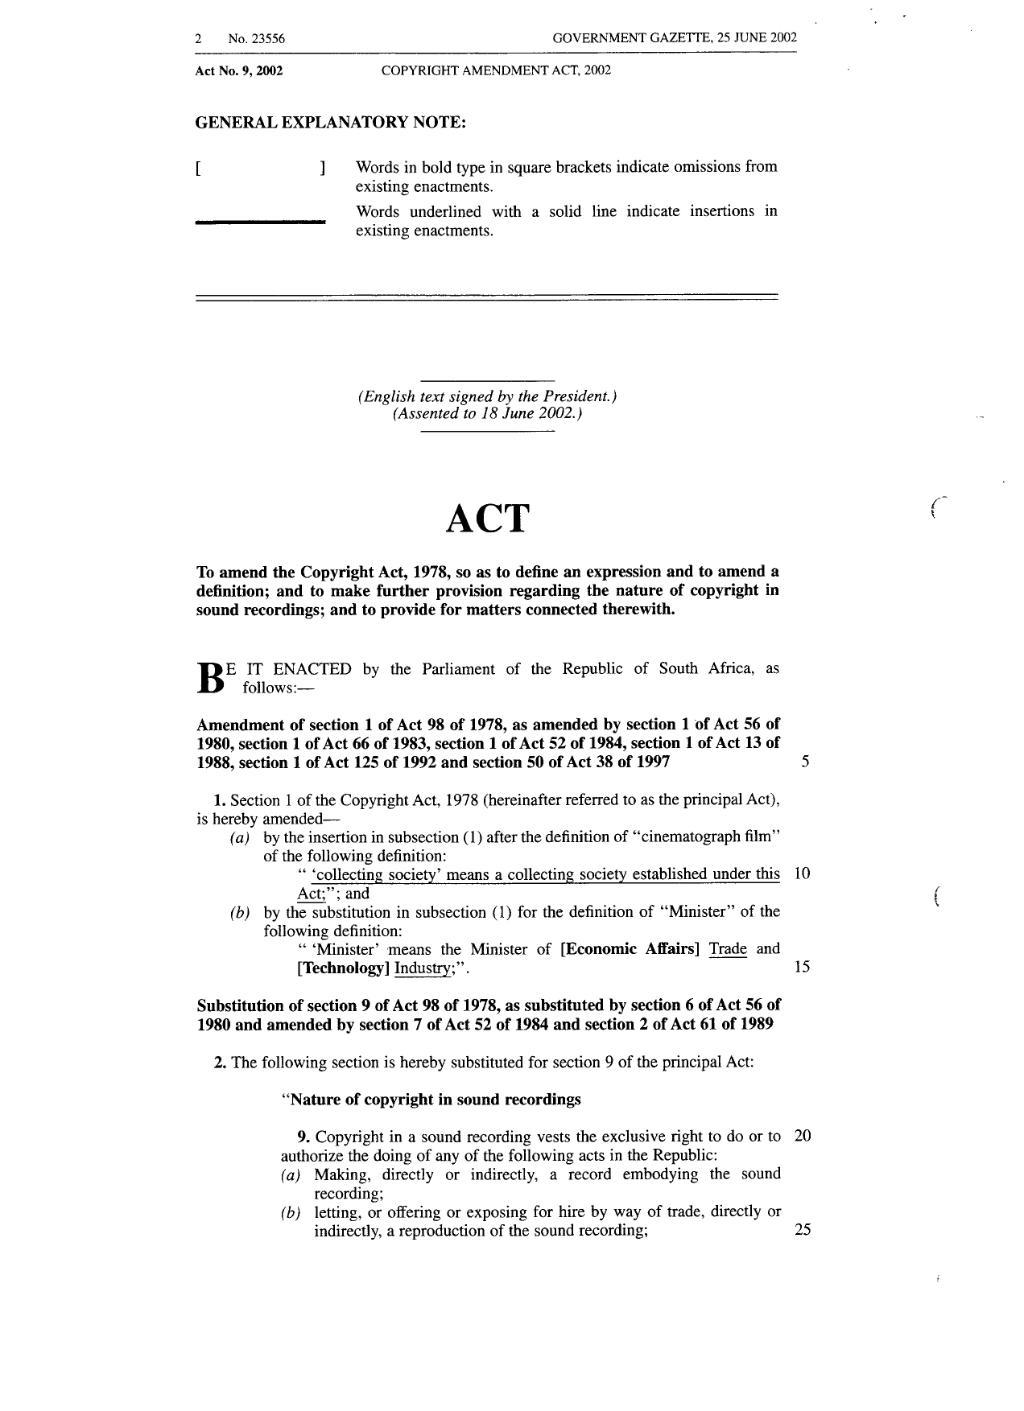 page:copyright amendment act 2002 from government gazette.djvu/2